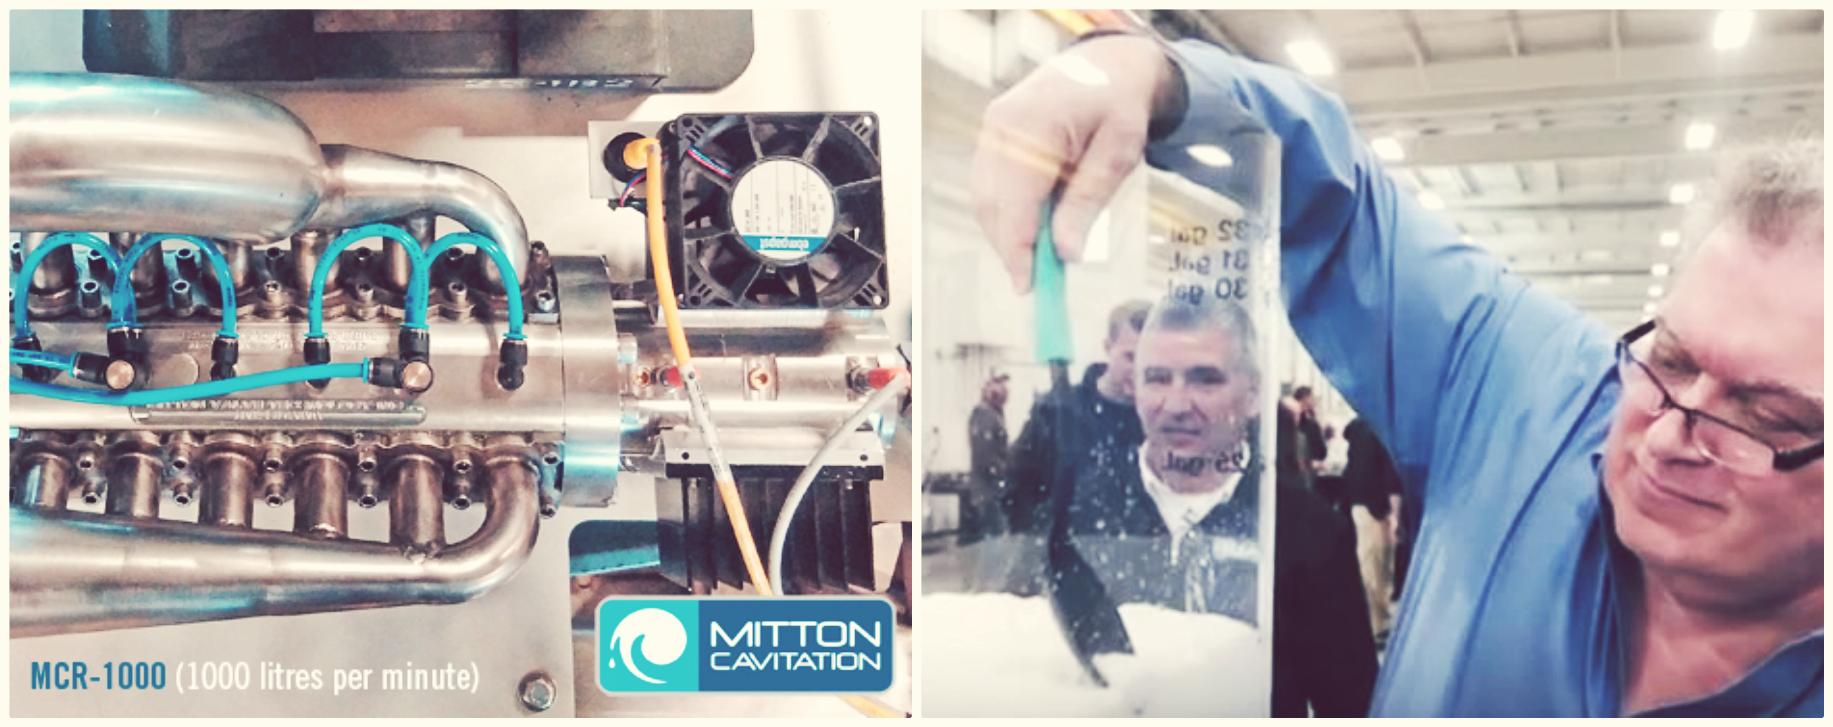 Mitton and the Mitton Cavitation Reactor, credit Mitton Cavitation